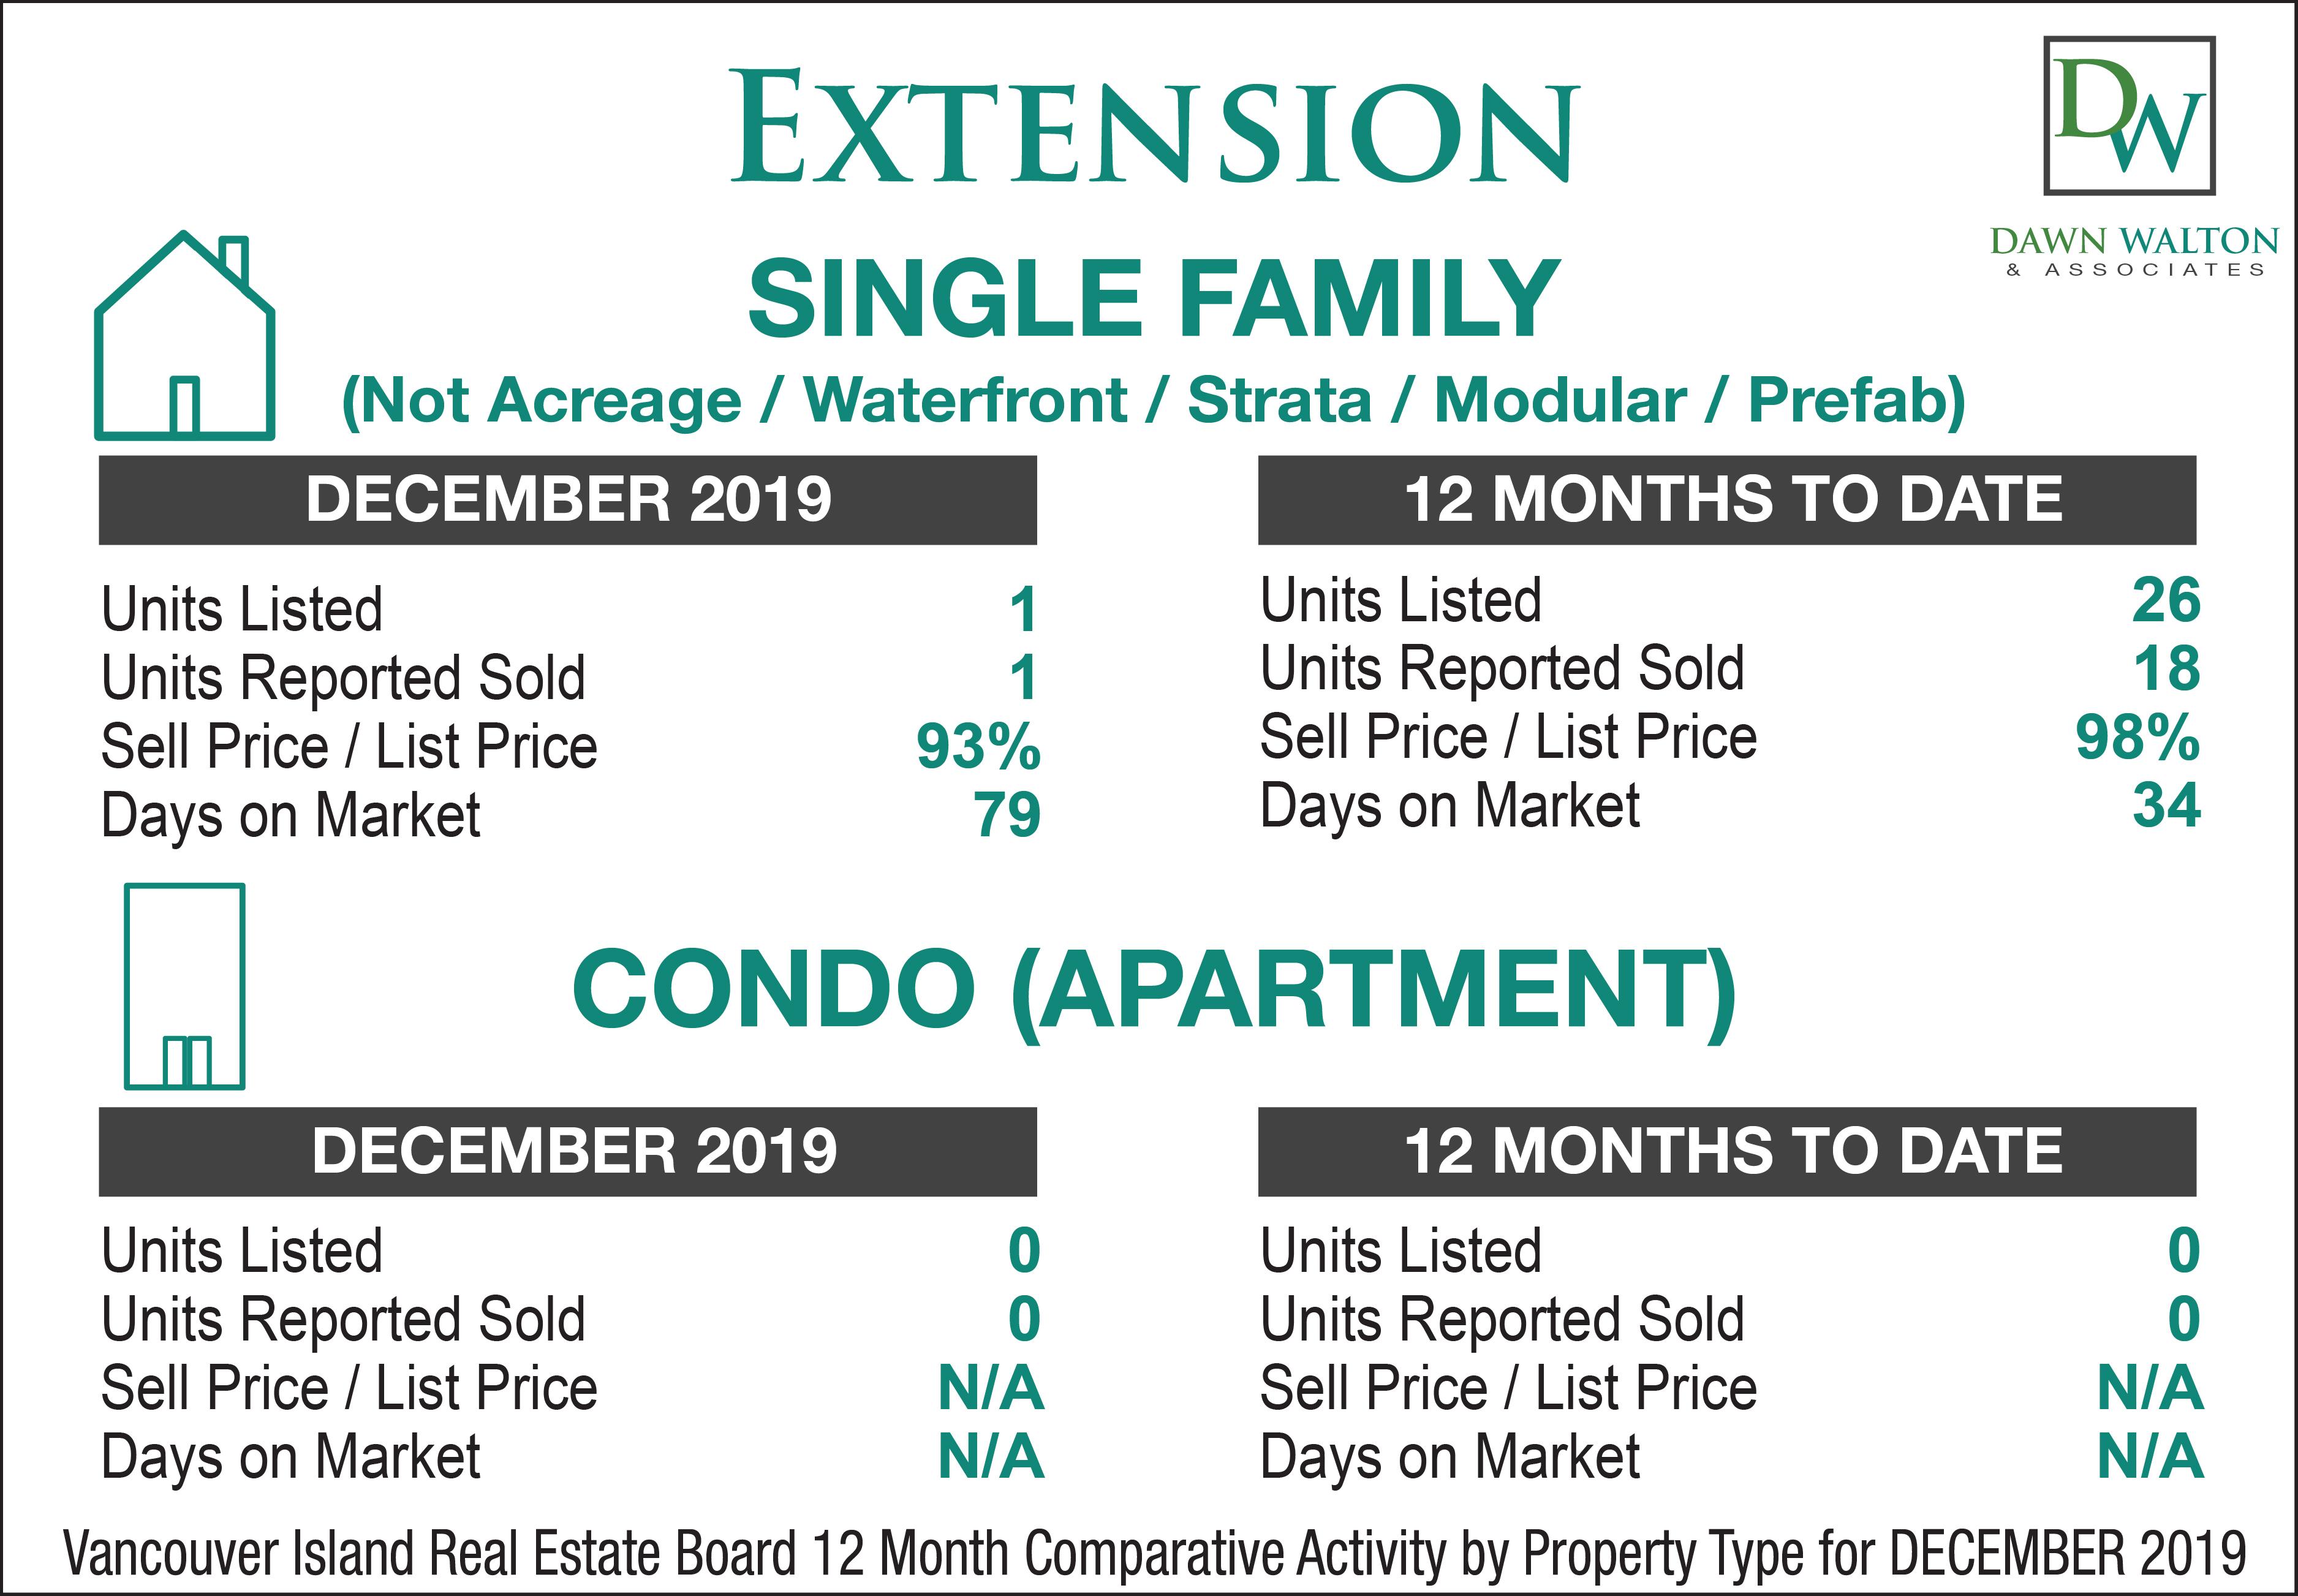 Extension Real Estate Market Stats December  2019 - Nanaimo Realtor Dawn Walton